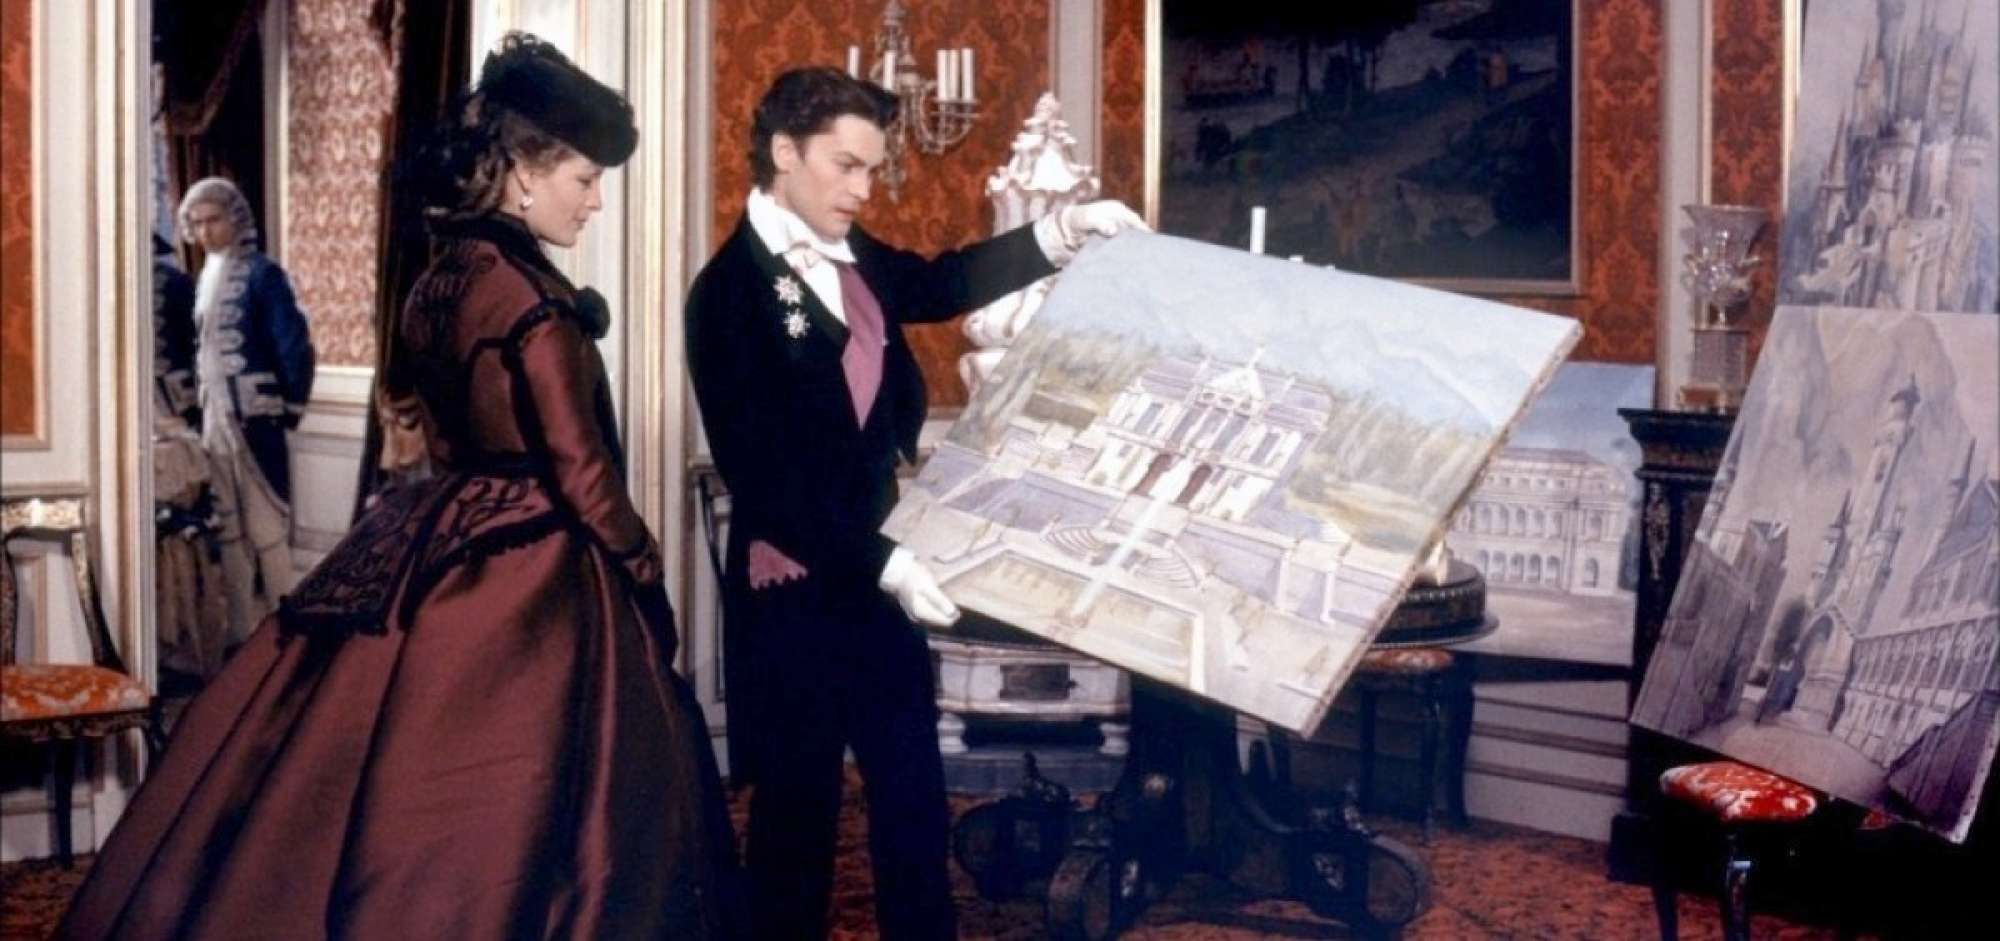 d350447bc3ce Ludwig - Regia Luchino Visconti - Costumi Piero Tosi